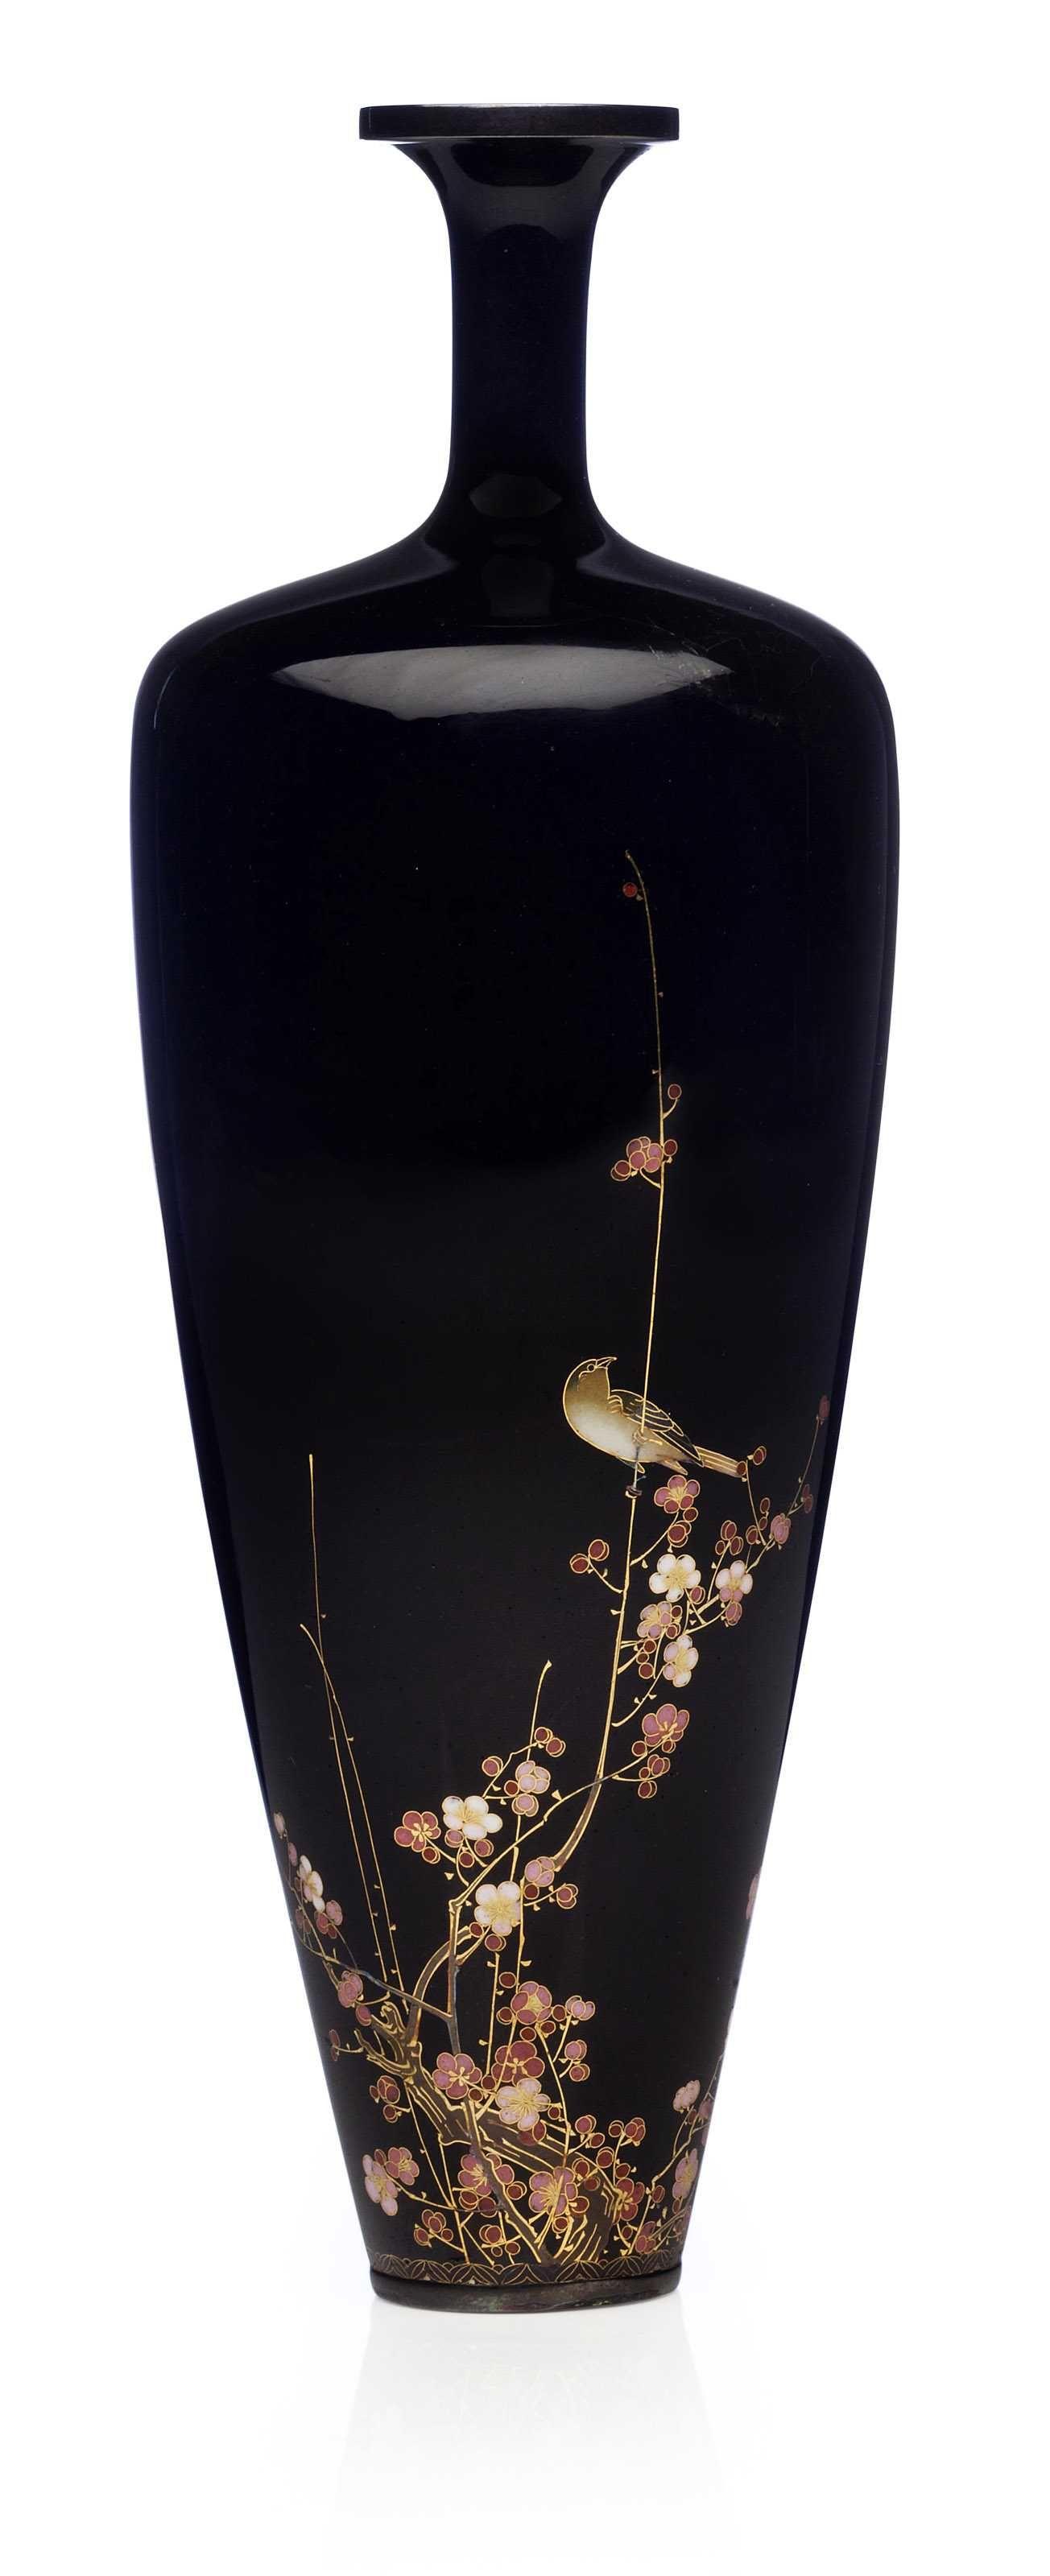 A Cloisonné vase, signed Kyoto Namikawa) workshop of Namikawa Yasuyuki(1845-1927), Meiji Period.